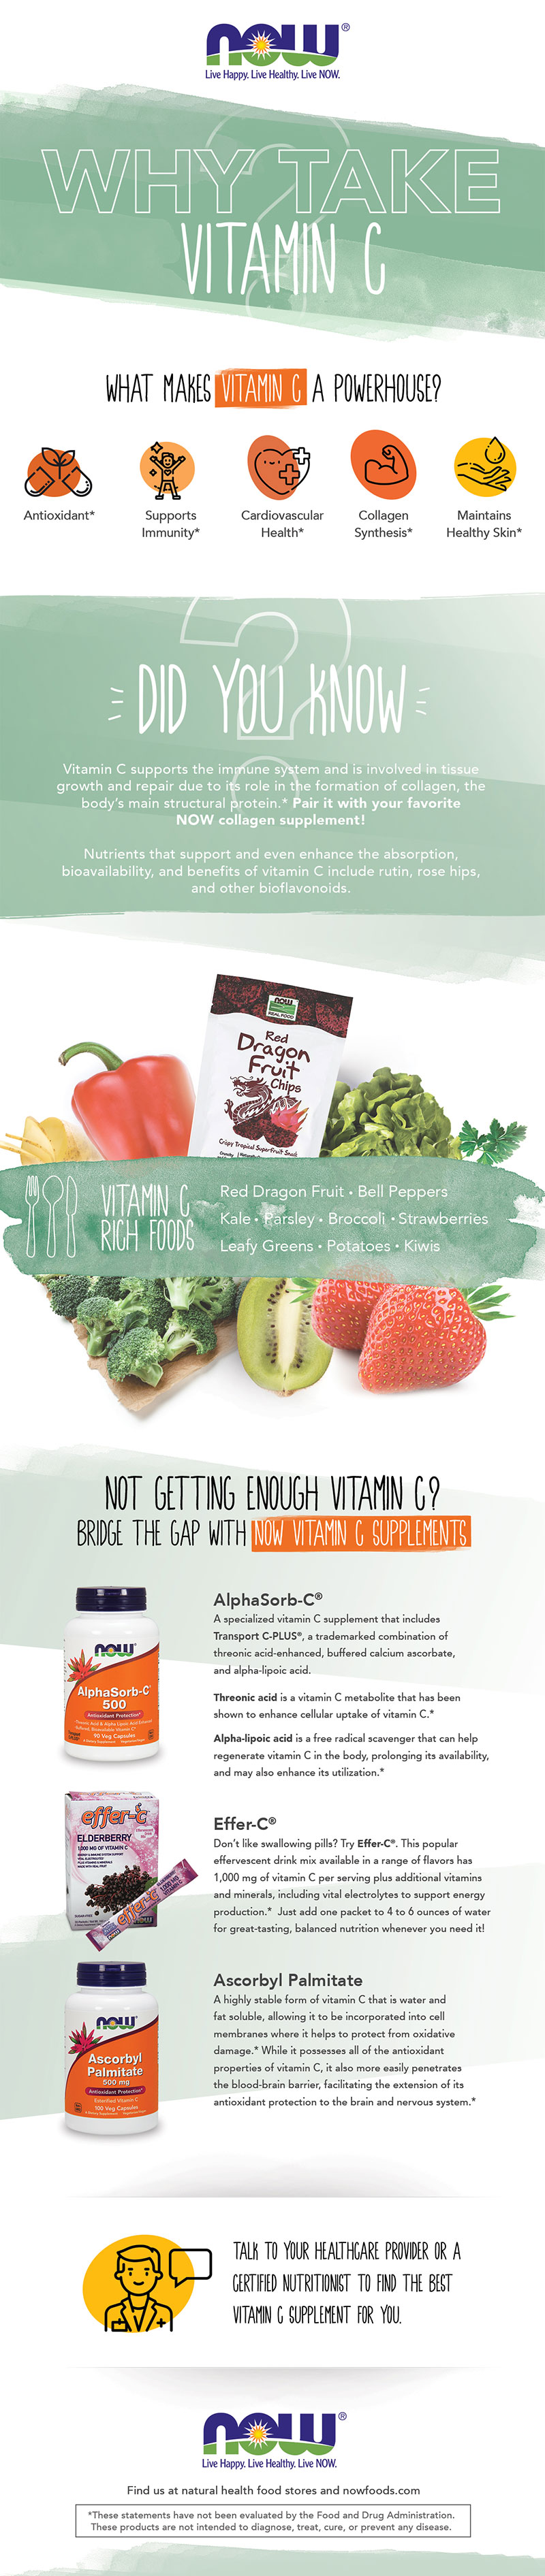 vitamin c infographic jpg